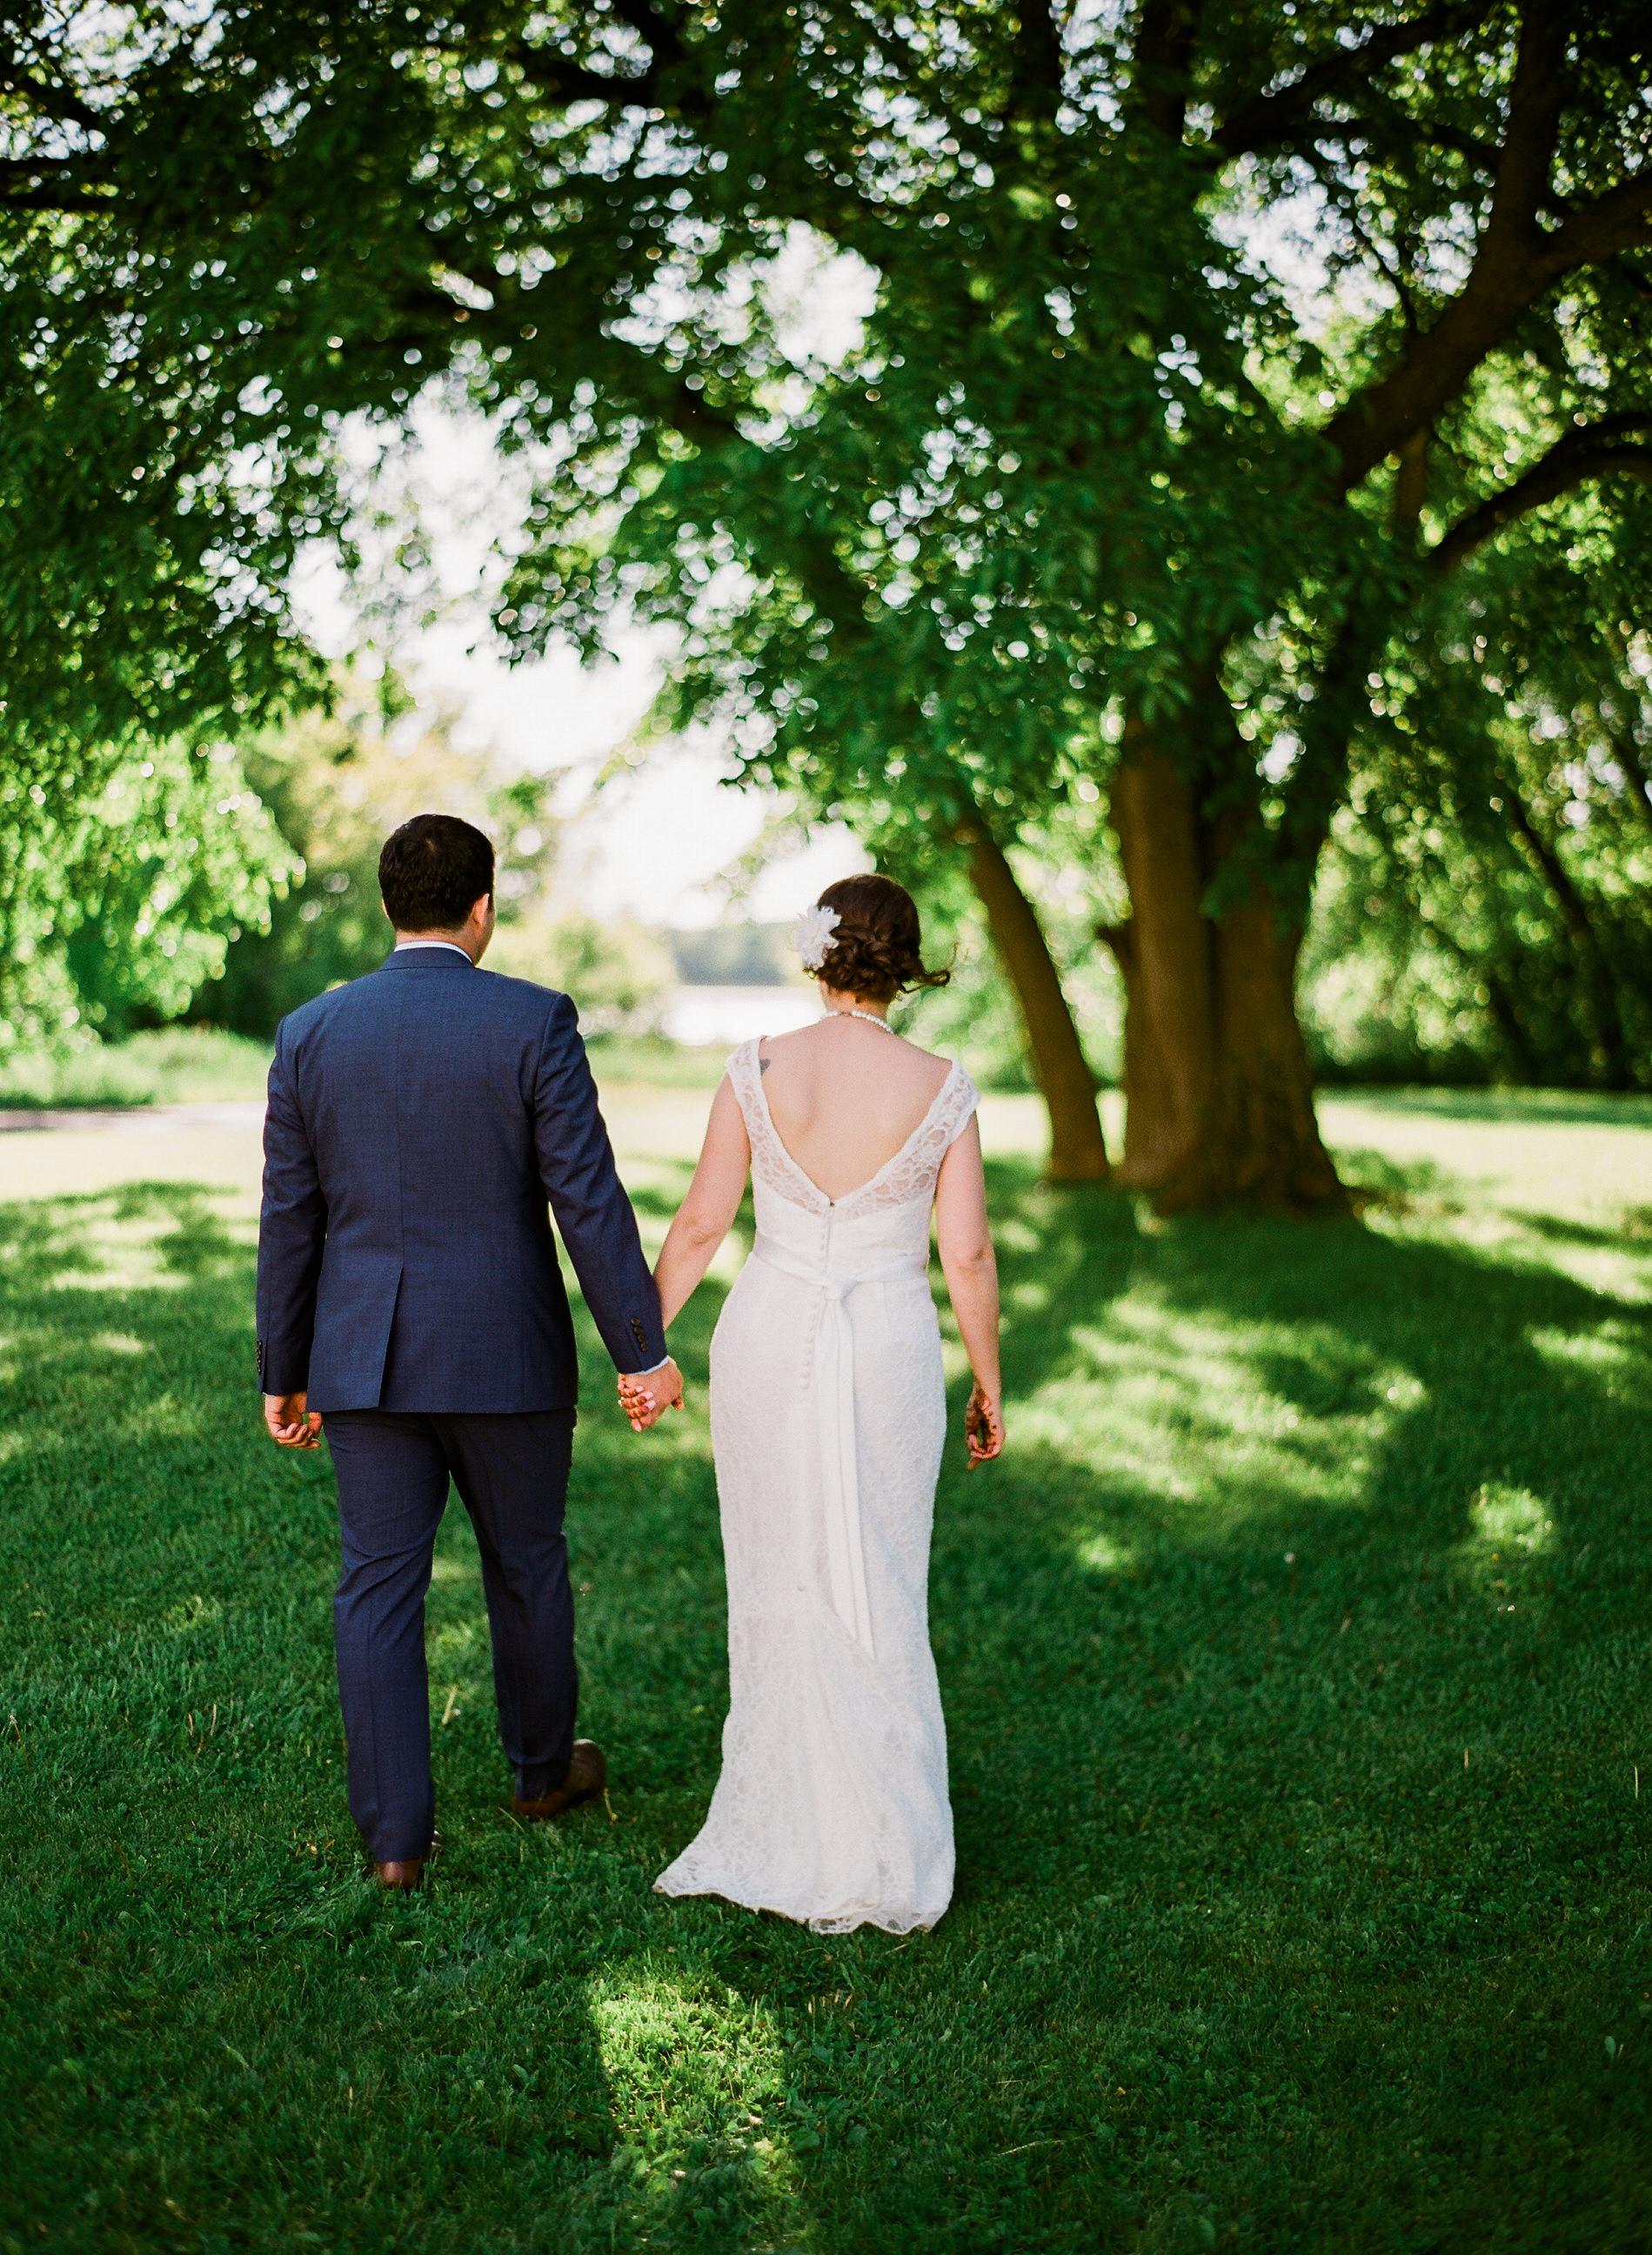 Minnesota Barn wedding at Bloom Lake Barn in Shafer